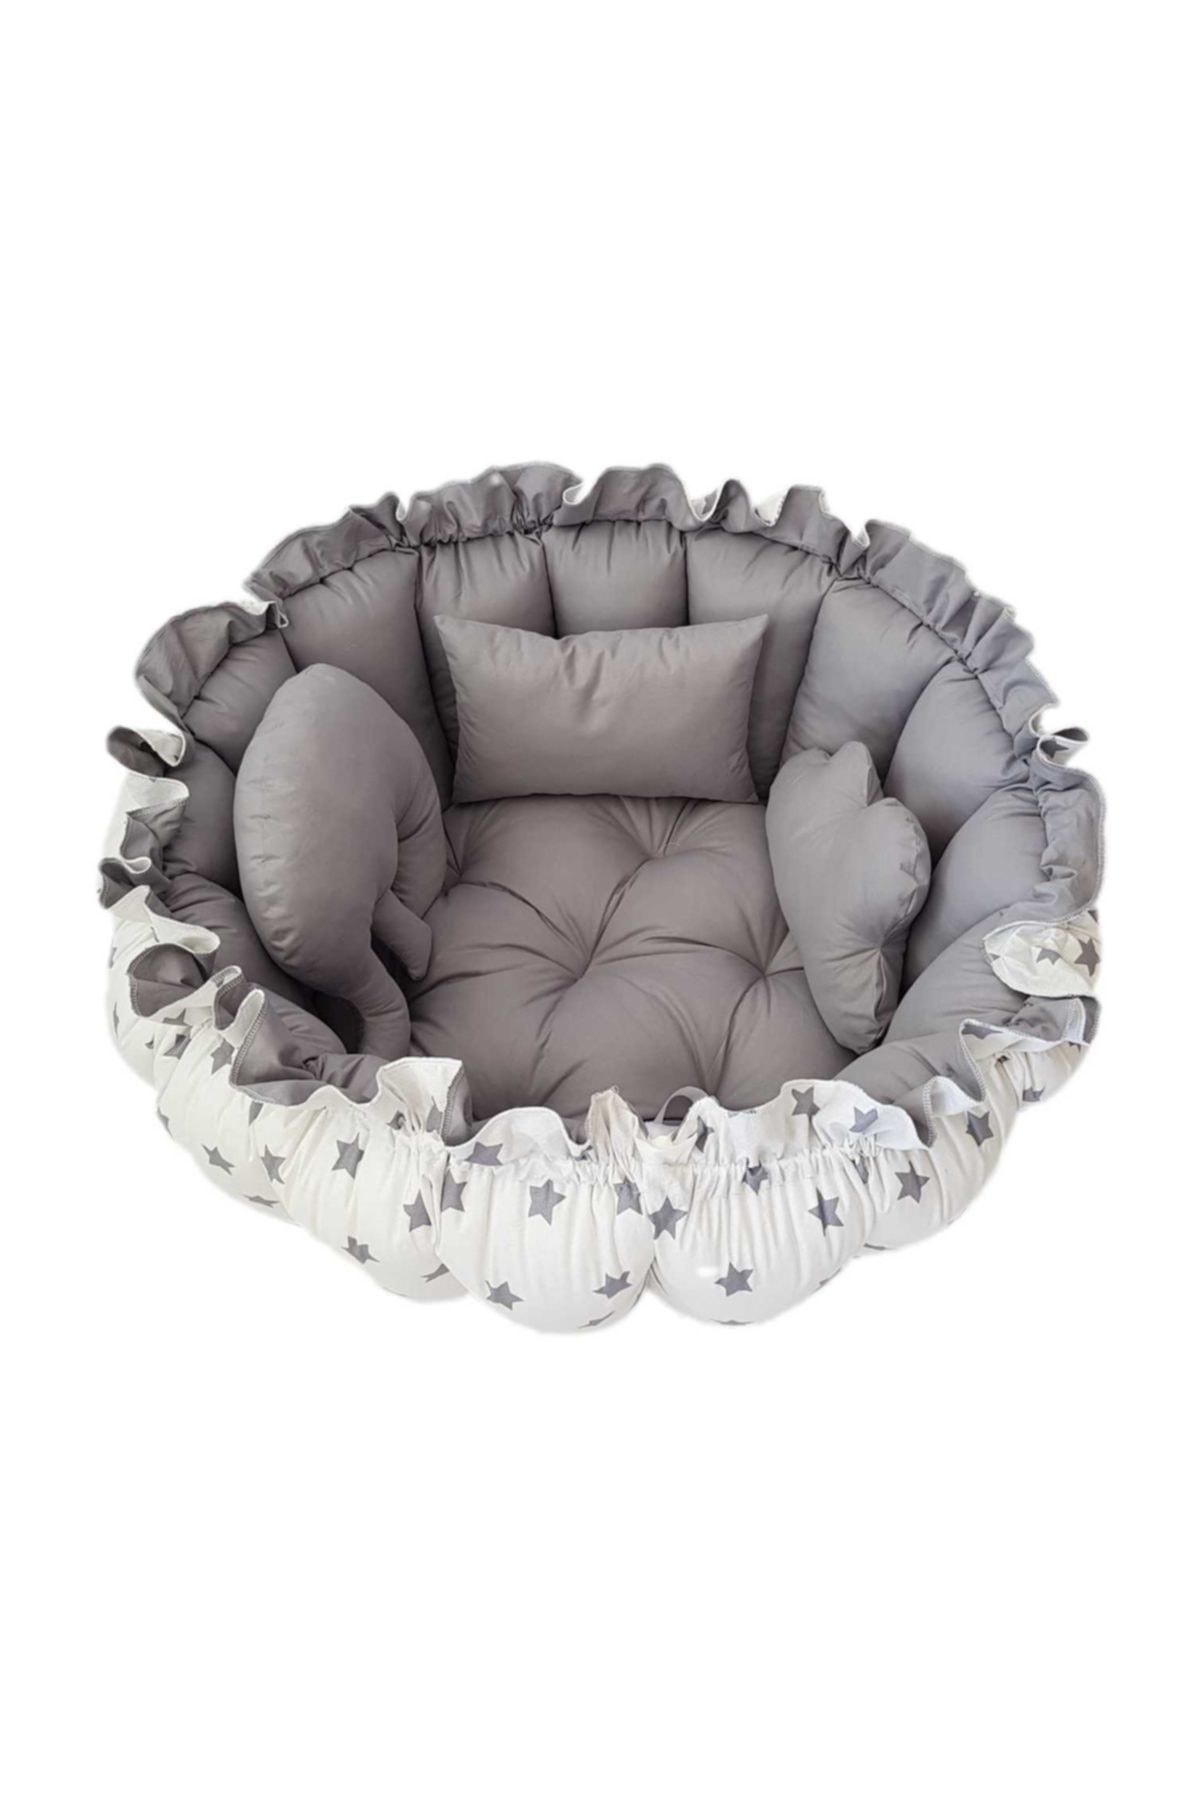 Babynest-Sleep And Play Mat Cotton Fabric-Коврик Babynest-Sleep And Play из хлопковой ткани enlarge